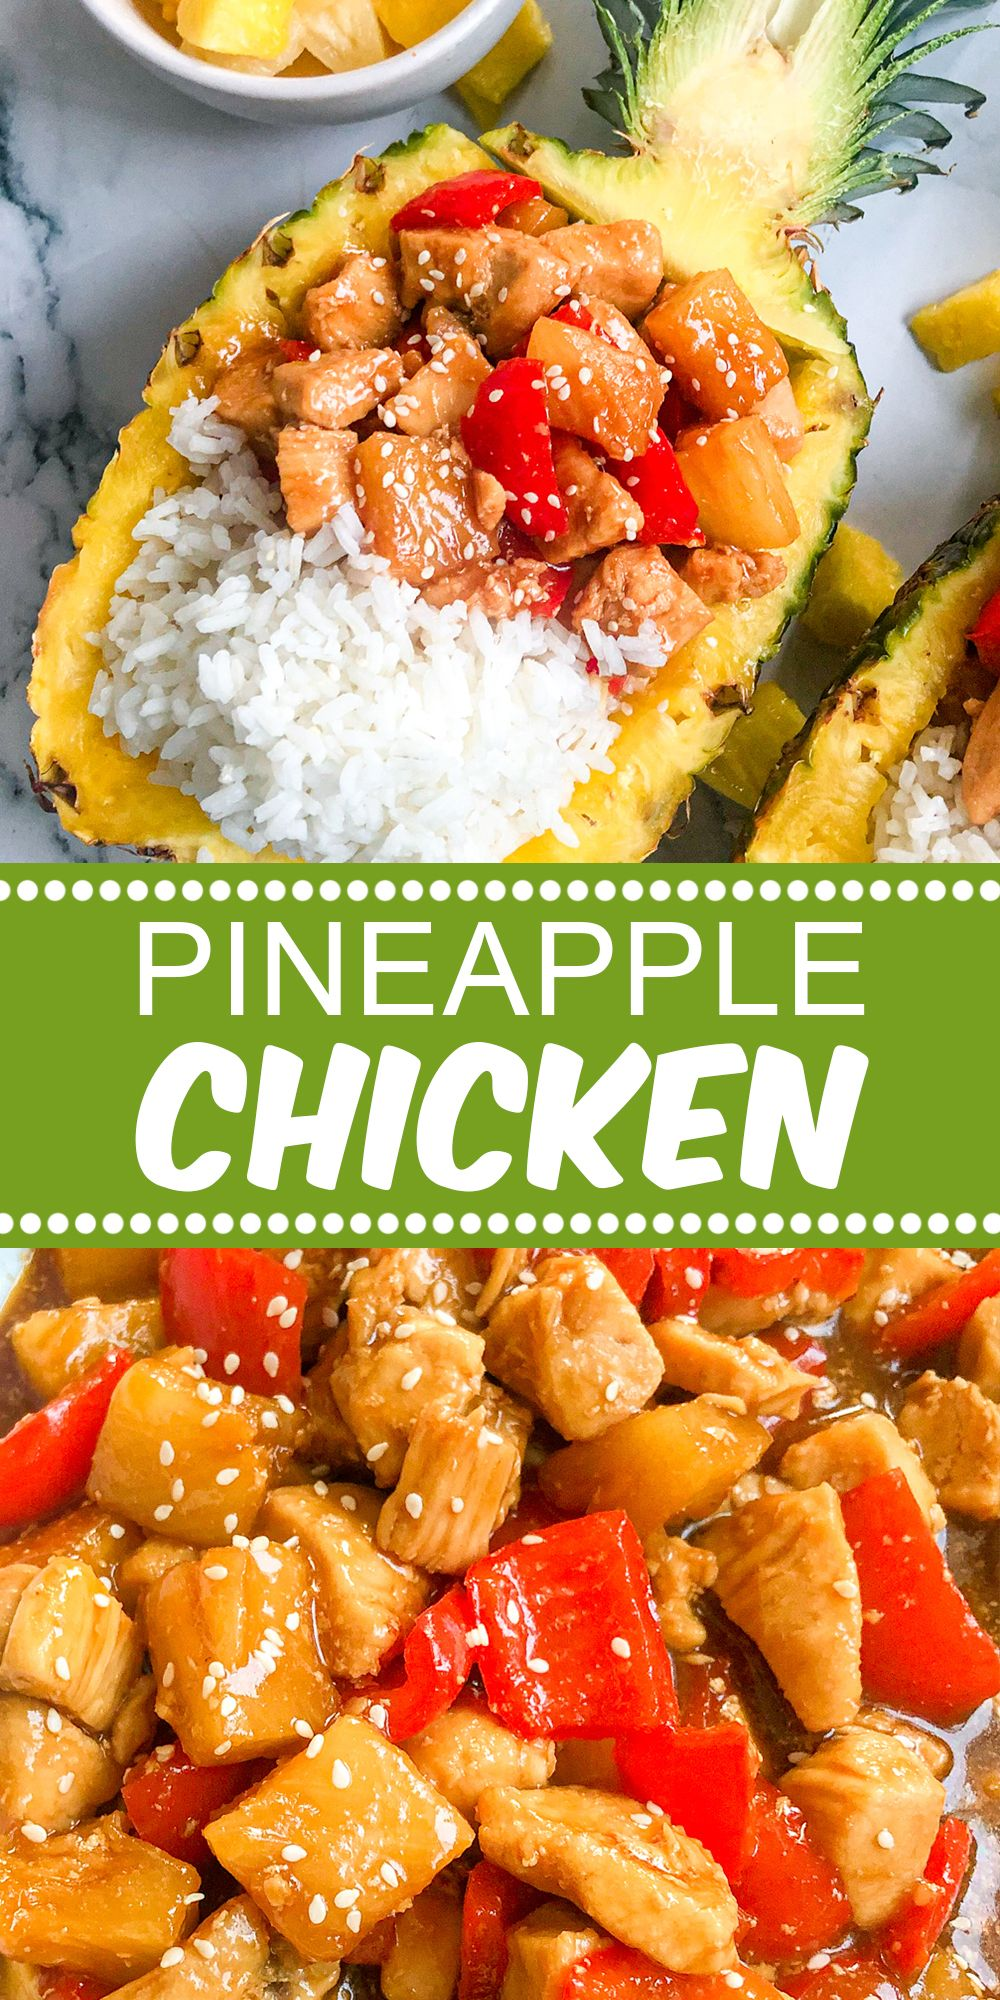 Pineapple Chicken Recipe Modernmealmakeover Com Recipe In 2021 Pineapple Chicken Pineapple Chicken Recipes Chicken Recipes